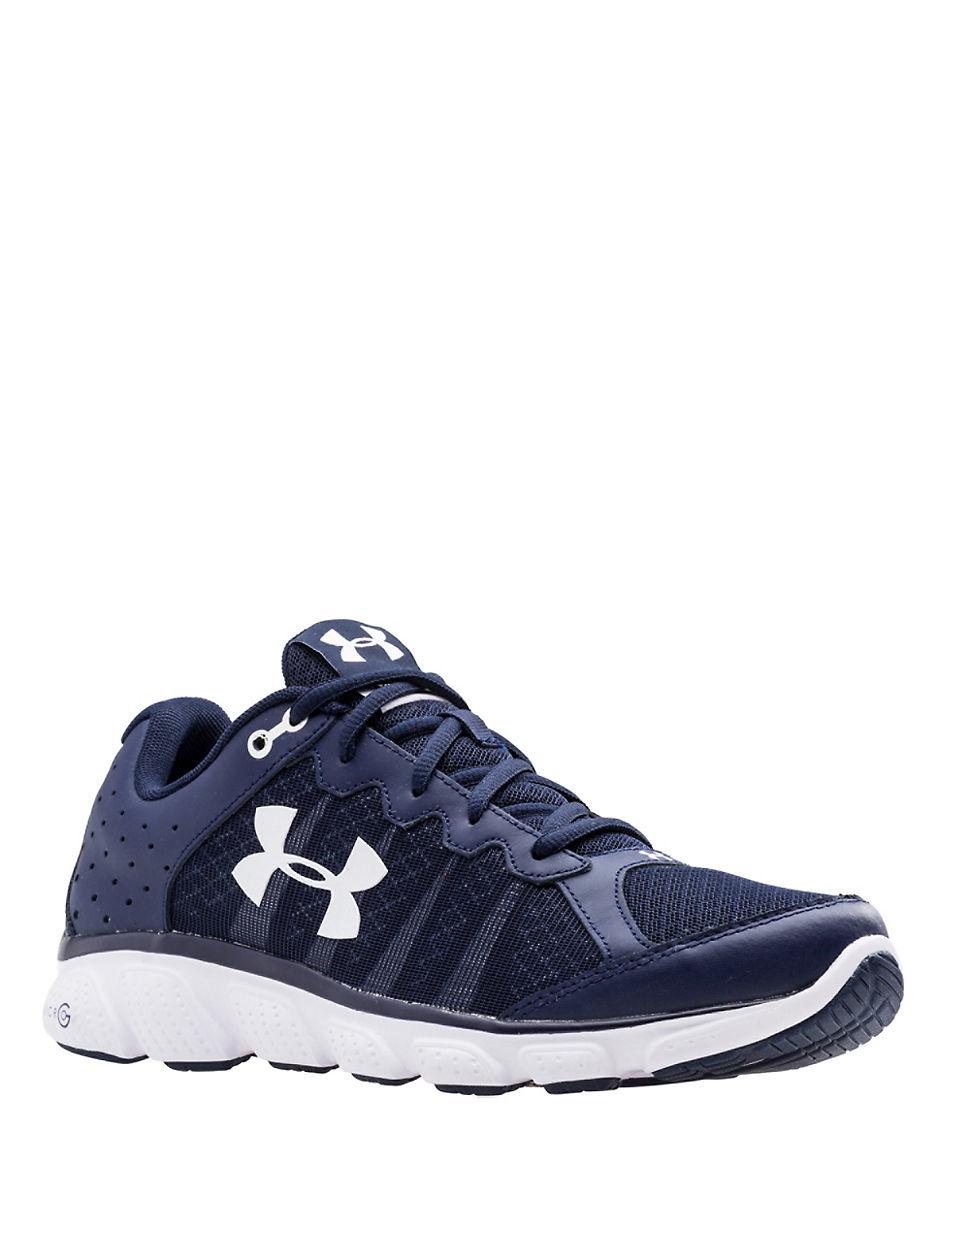 Under Armour Assert 6 Running Shoes In Blue For Men Lyst